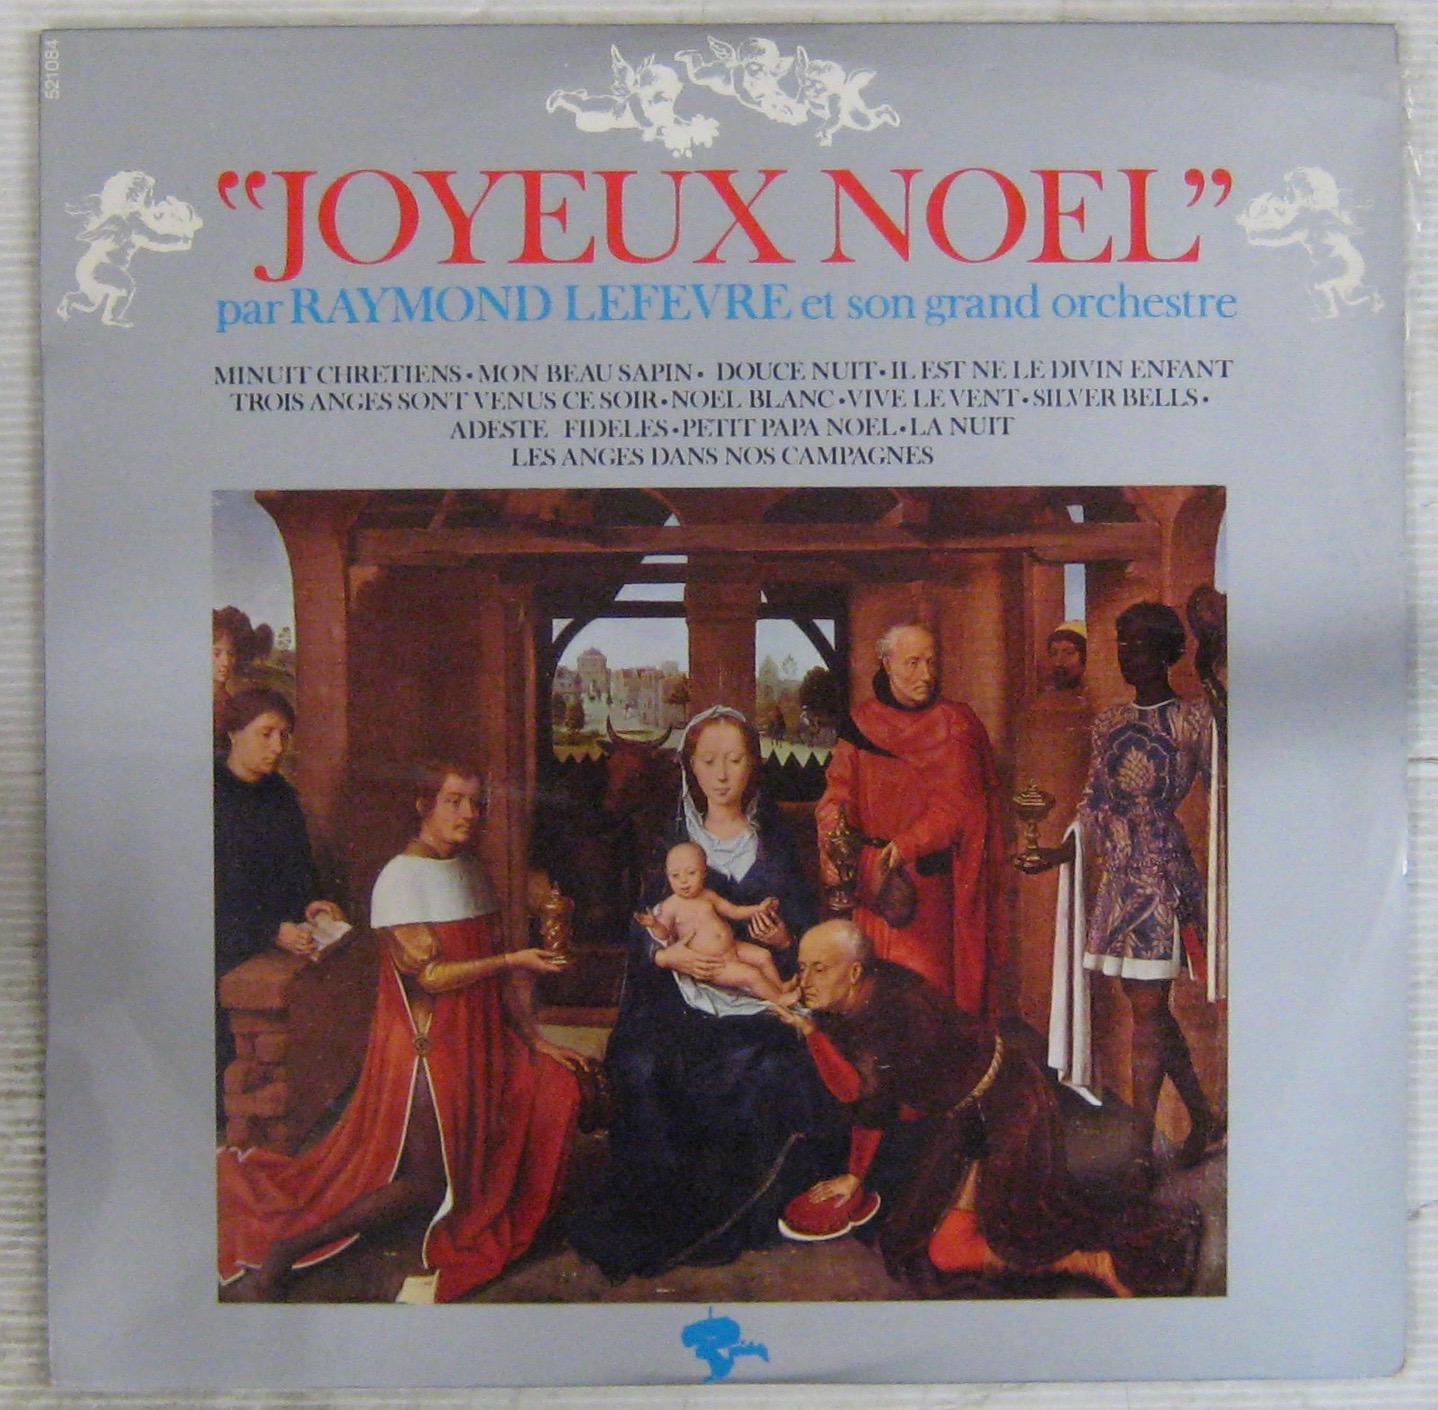 Adeste Fideles Joyeux Noel.Joyeux Noel By Raymond Lefevre Et Son Orchestre Lp With